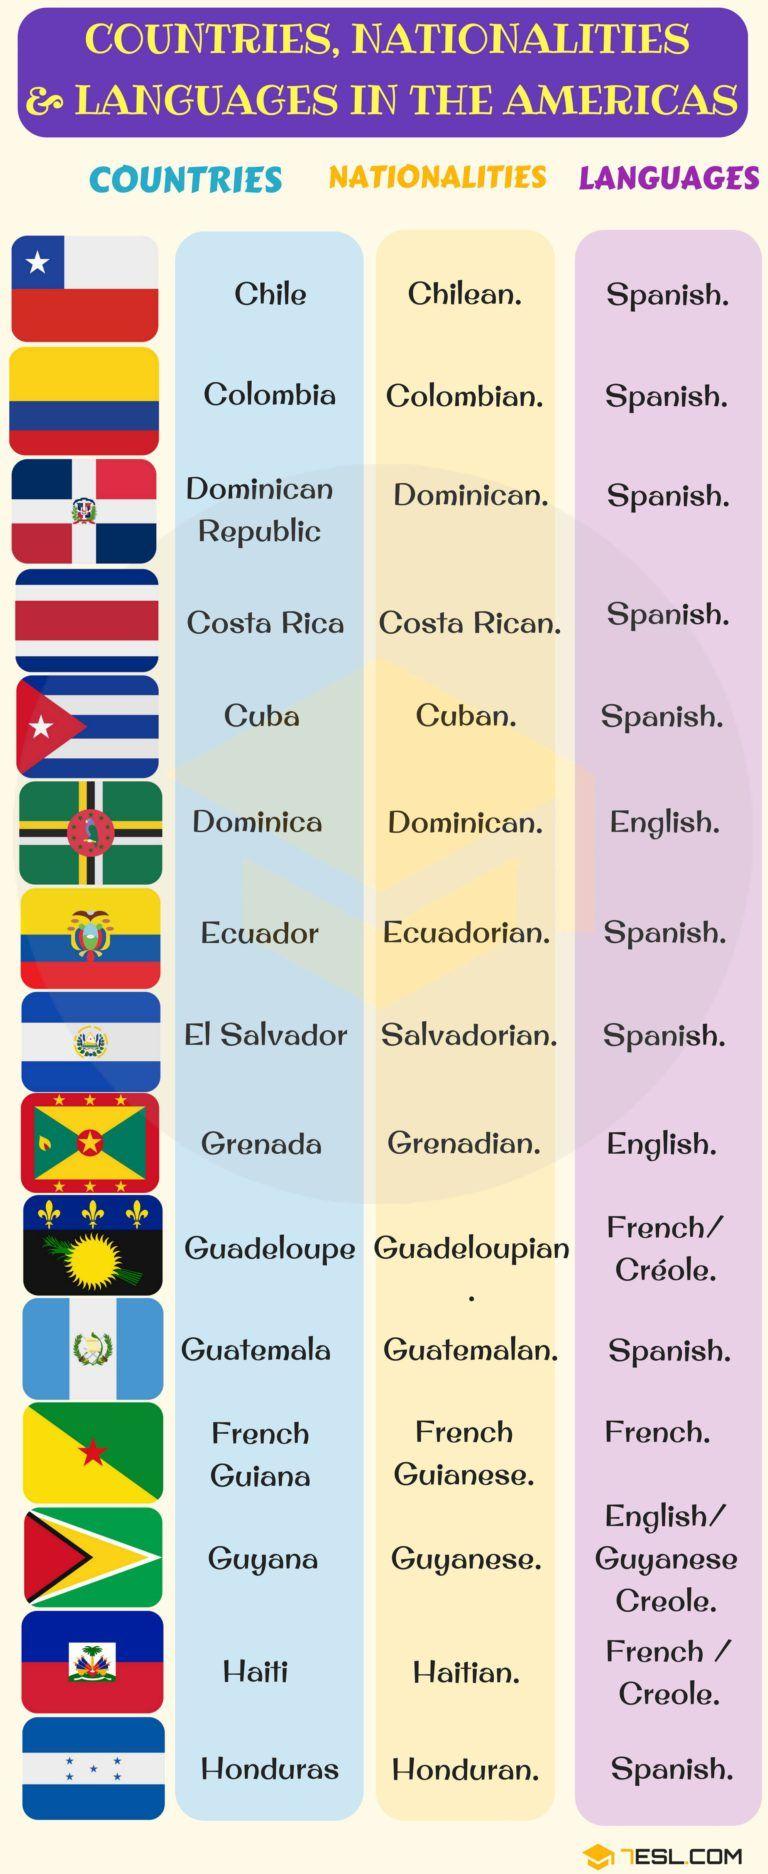 Pin De Chelo M En English Language Nacionalidades En Ingles Actividades En Clase Aprendizaje